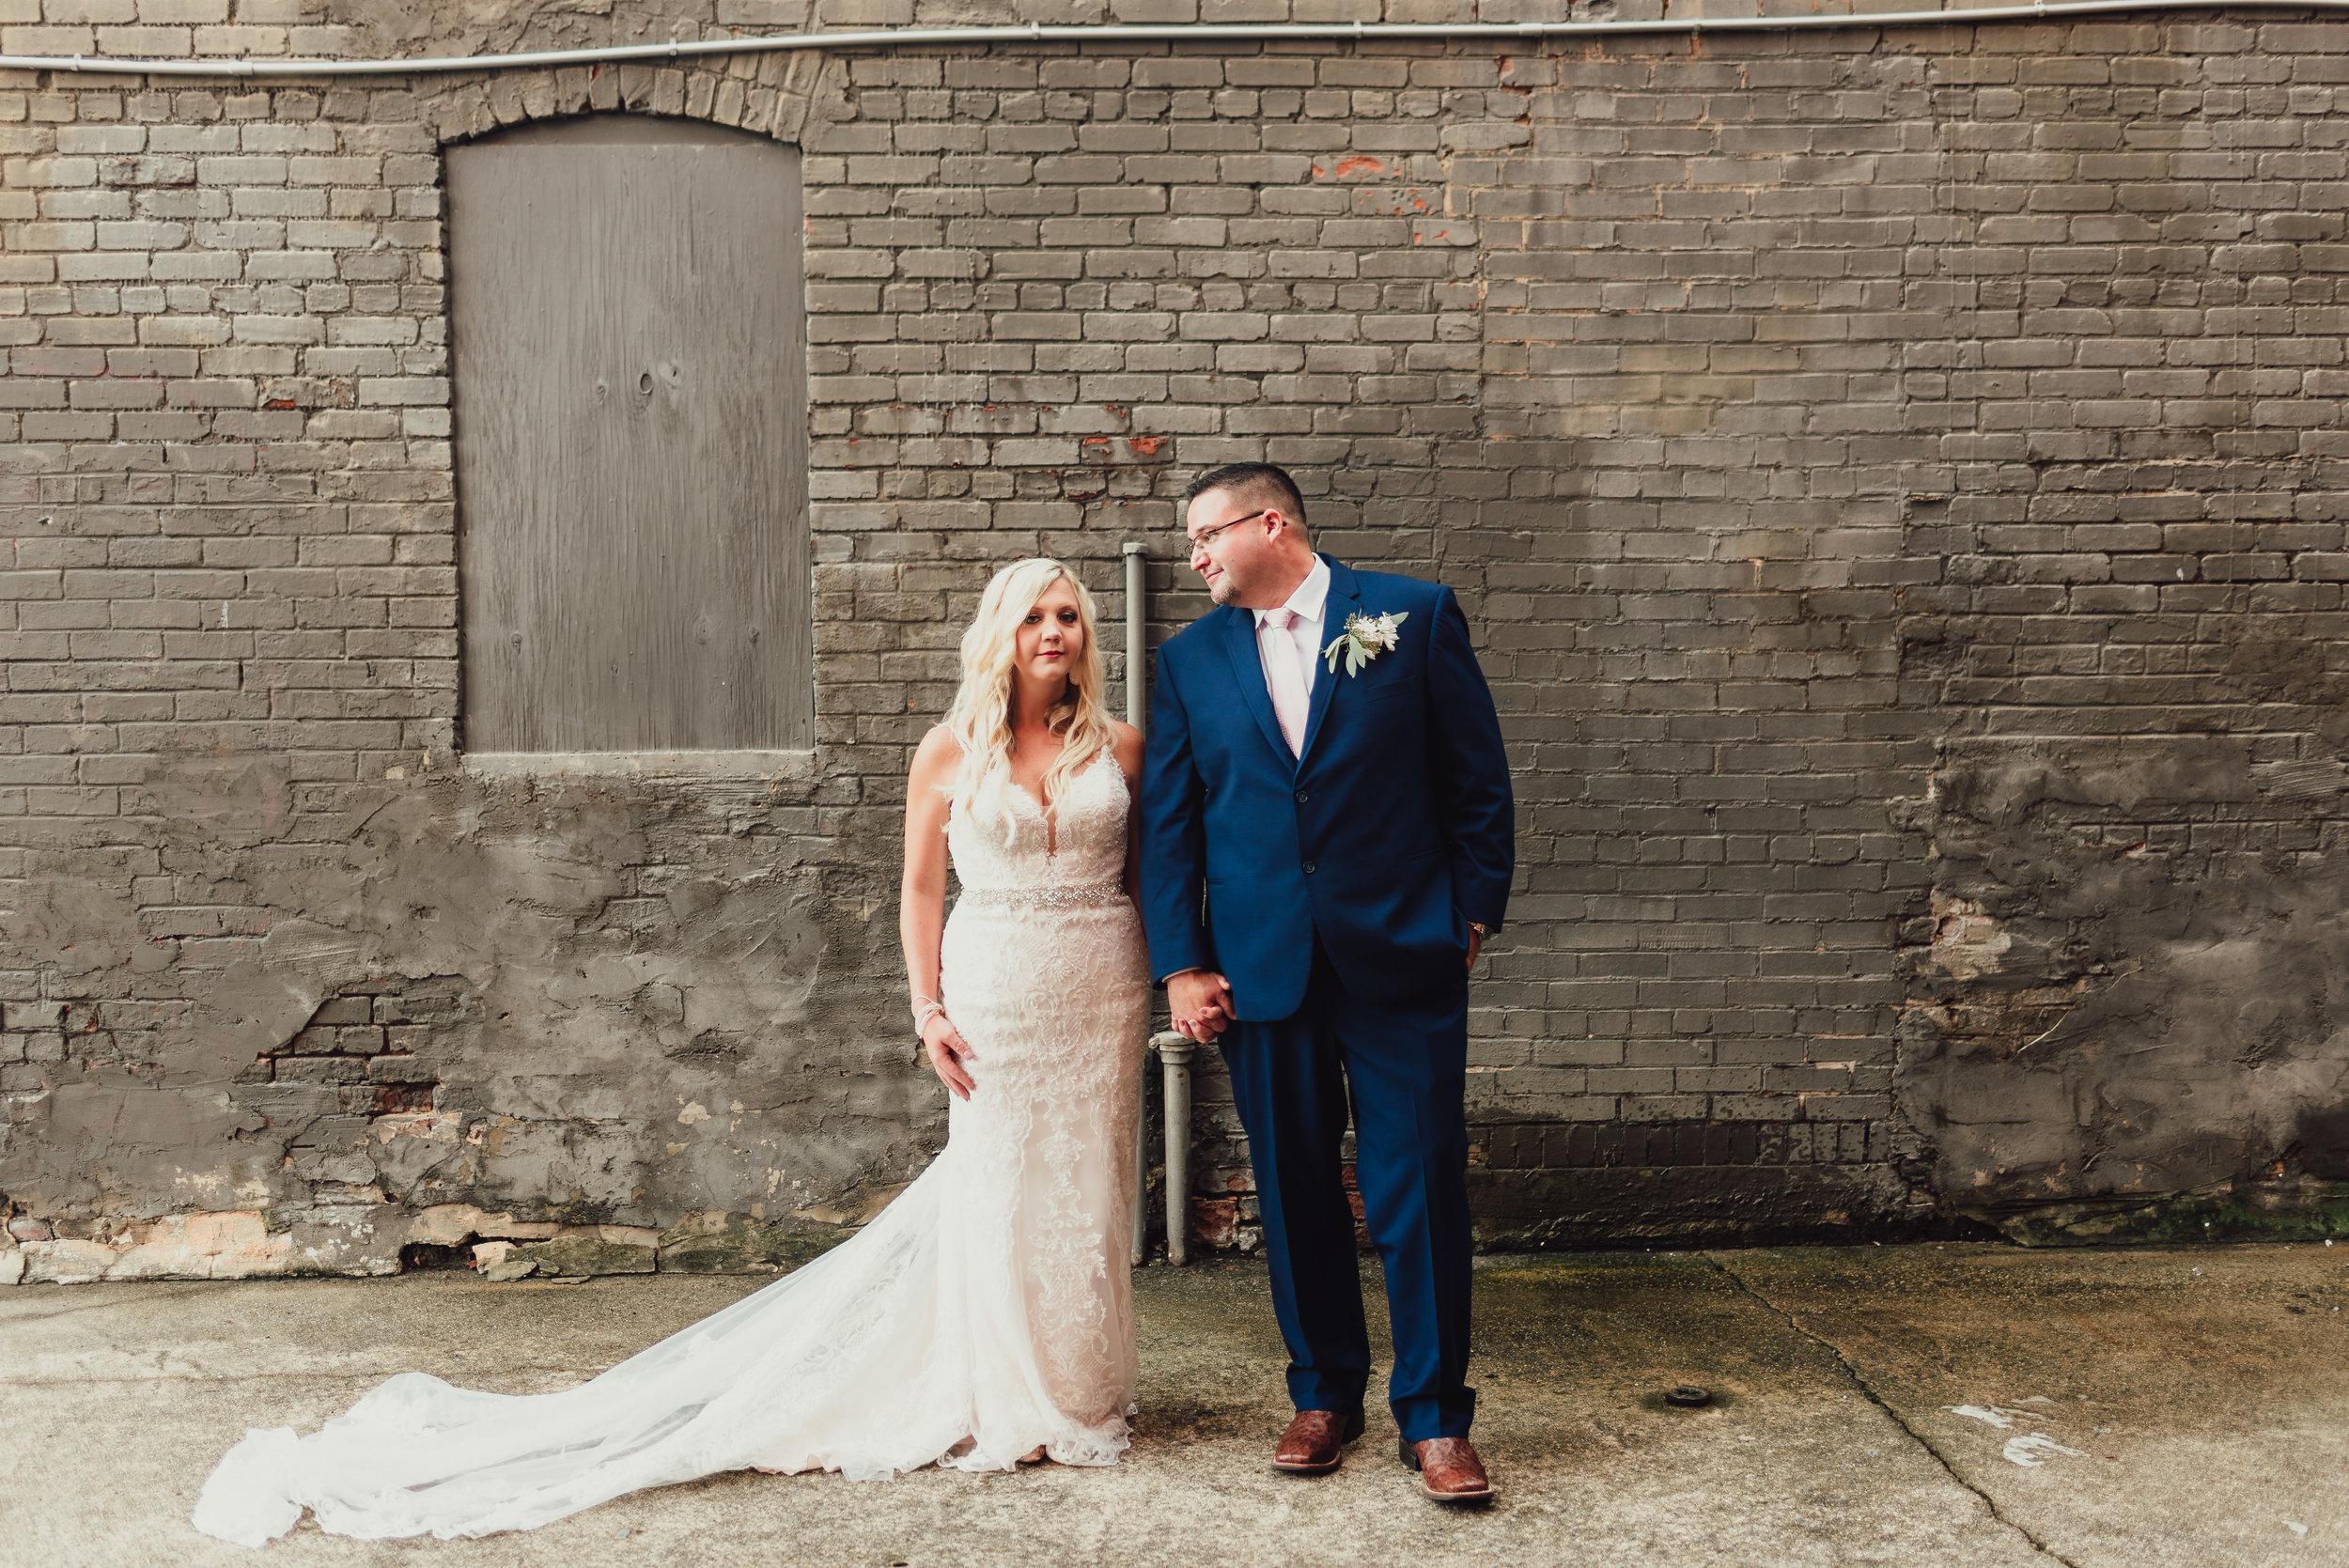 east-tn-wedding-photographer-tennessee-elopement-photographer-kingsport-tn-wedding-photographer (664 of 1001).jpg